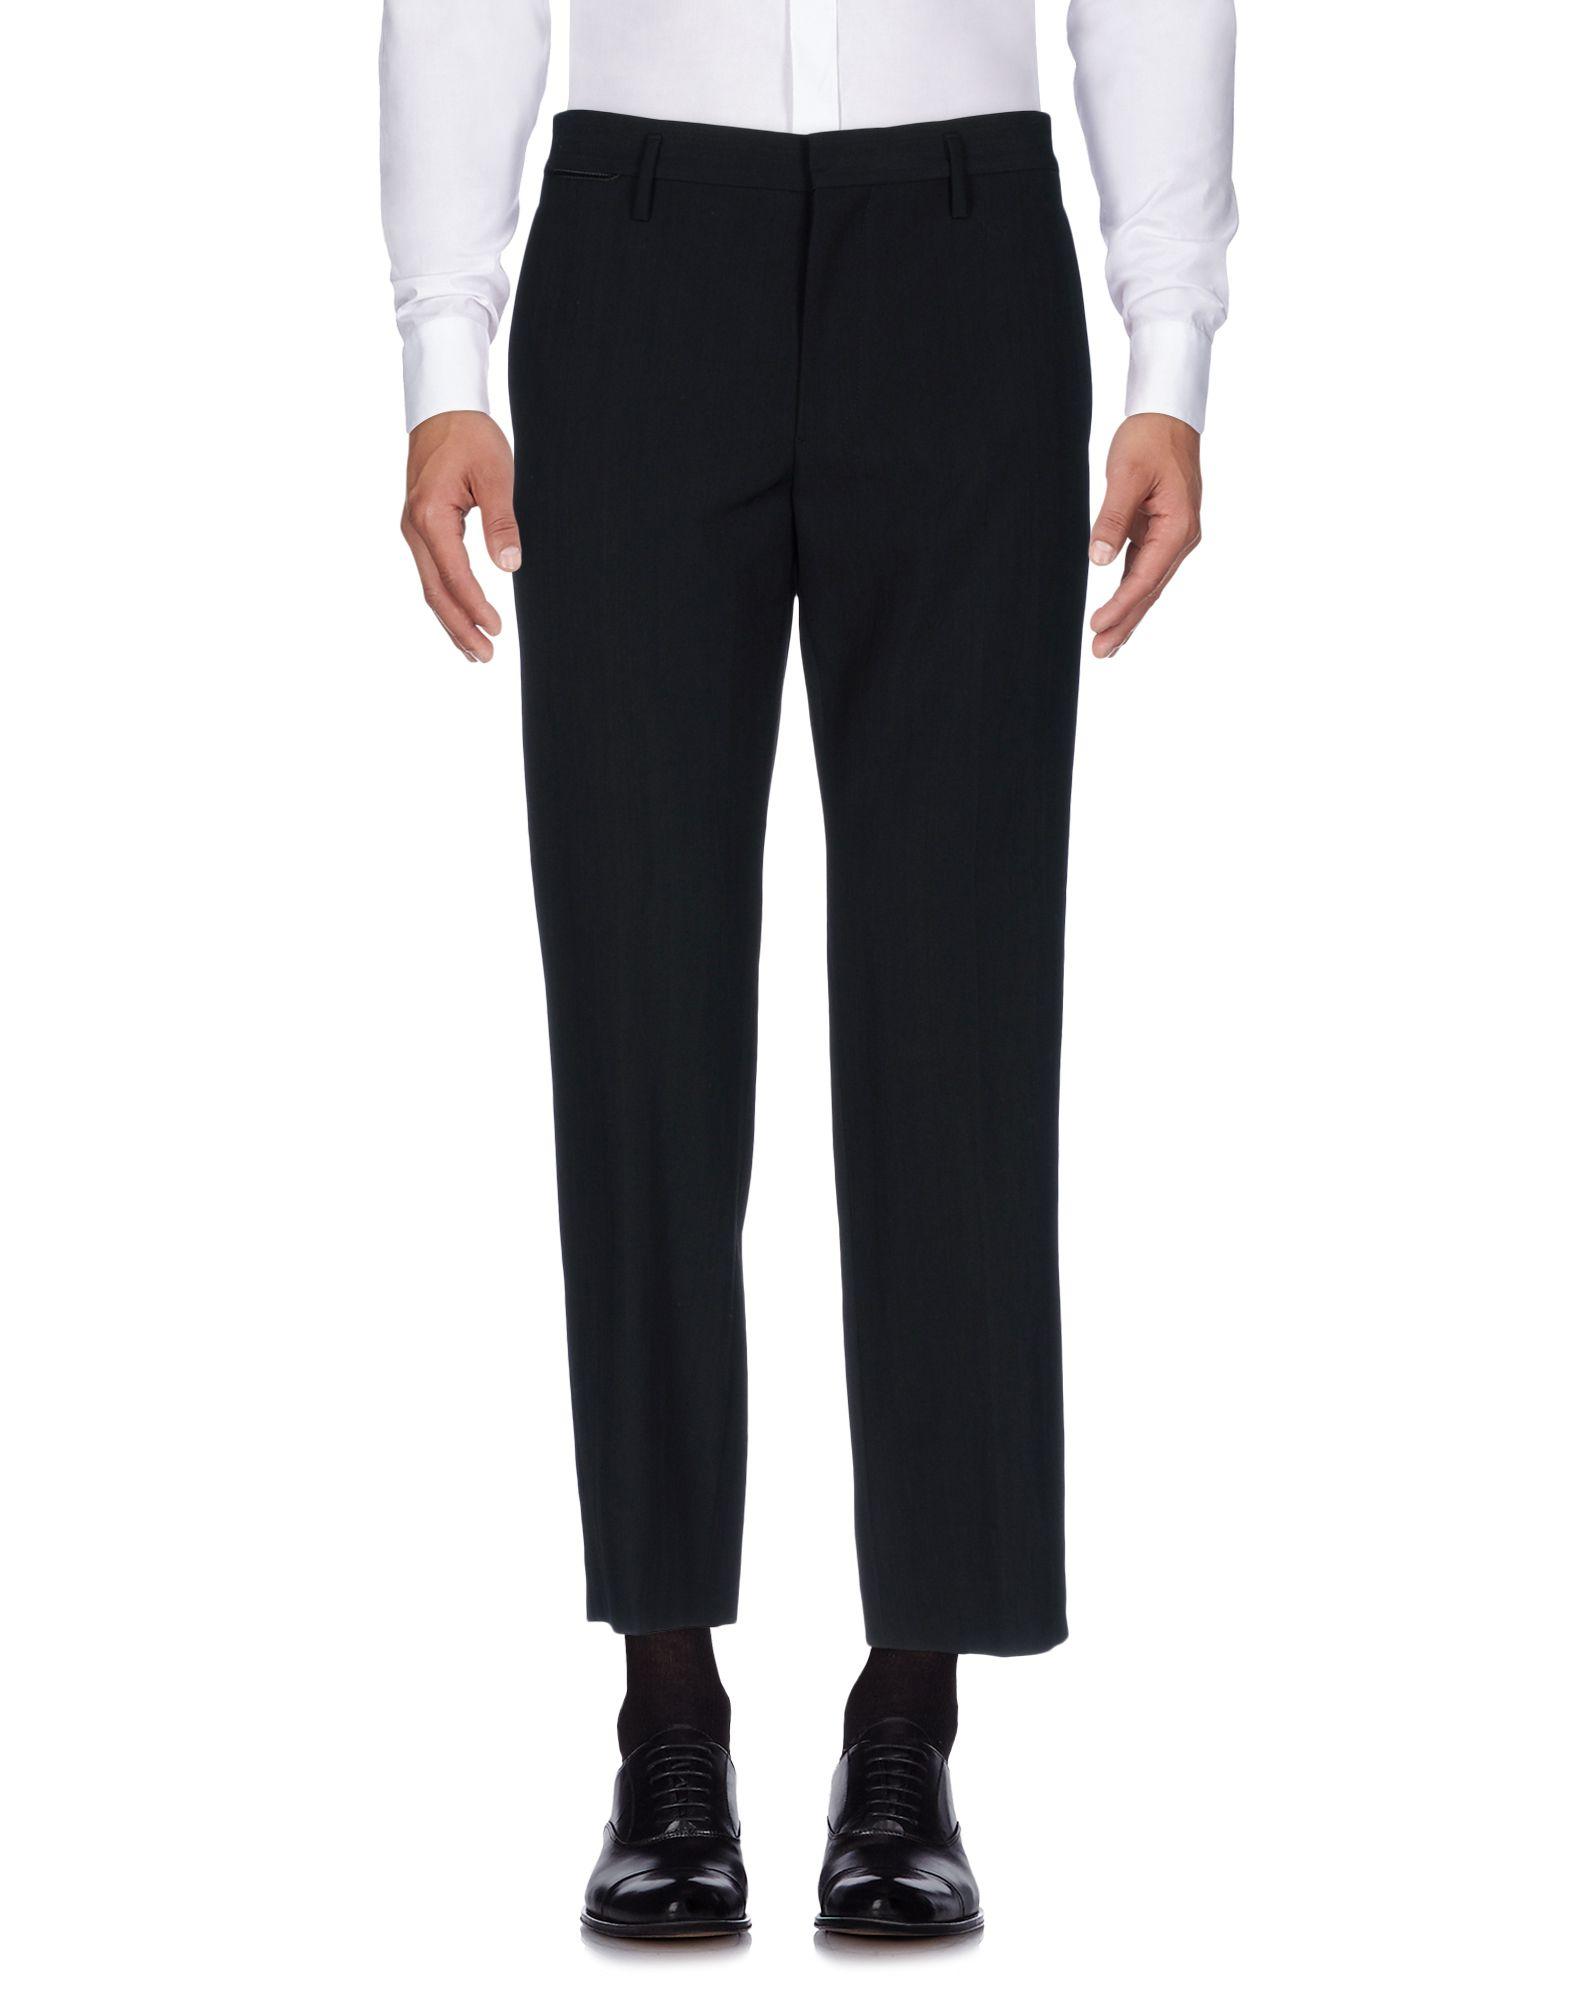 Pantalone Marc Jacobs Uomo - Acquista online su